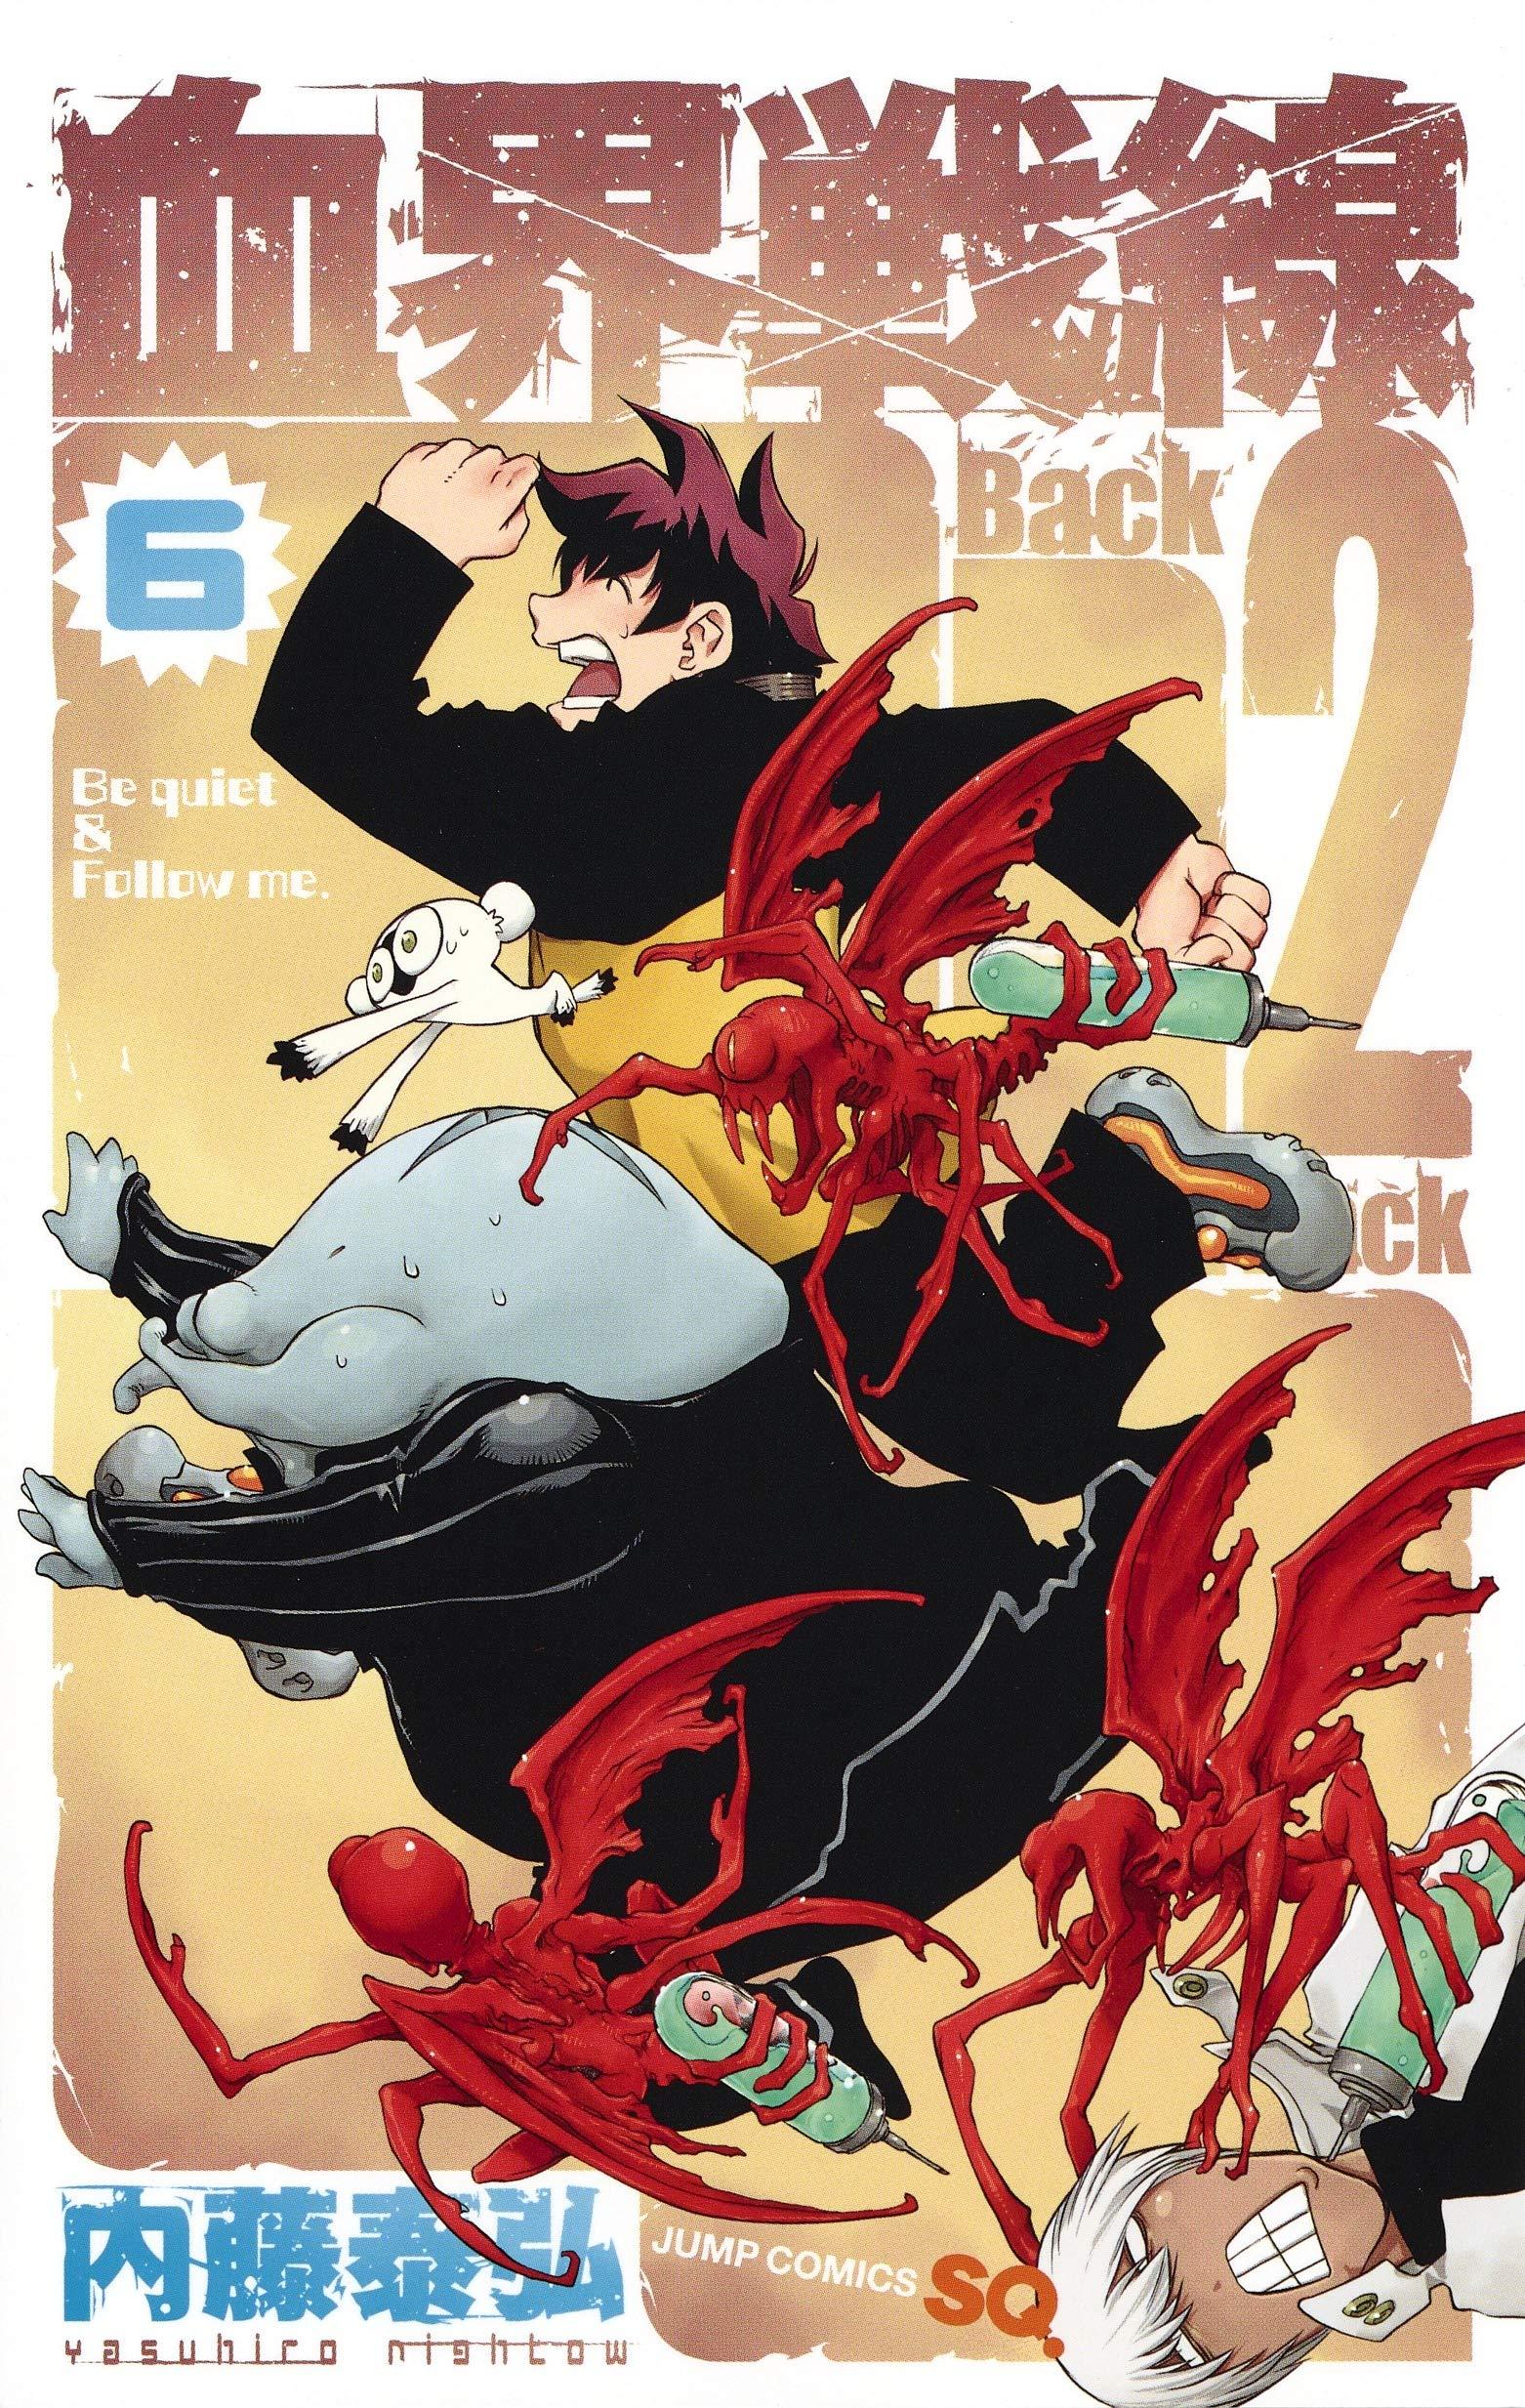 Kekkai Sensen - Back 2 Back 6